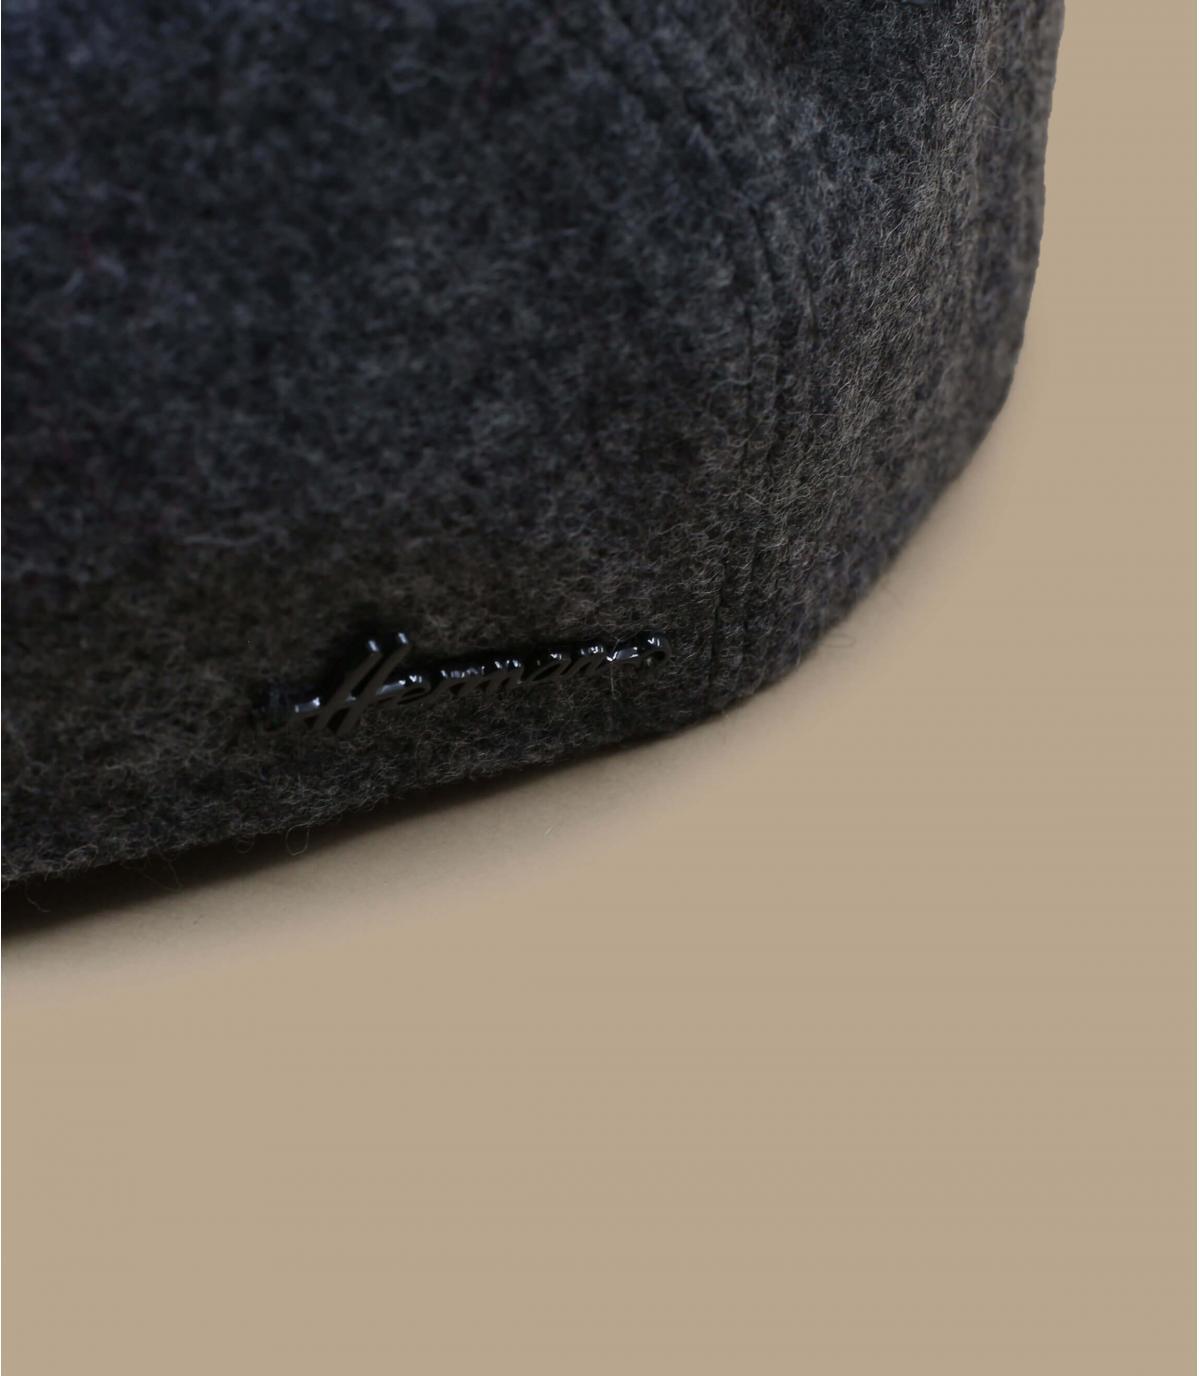 Détails Hill wool EF grey - image 2